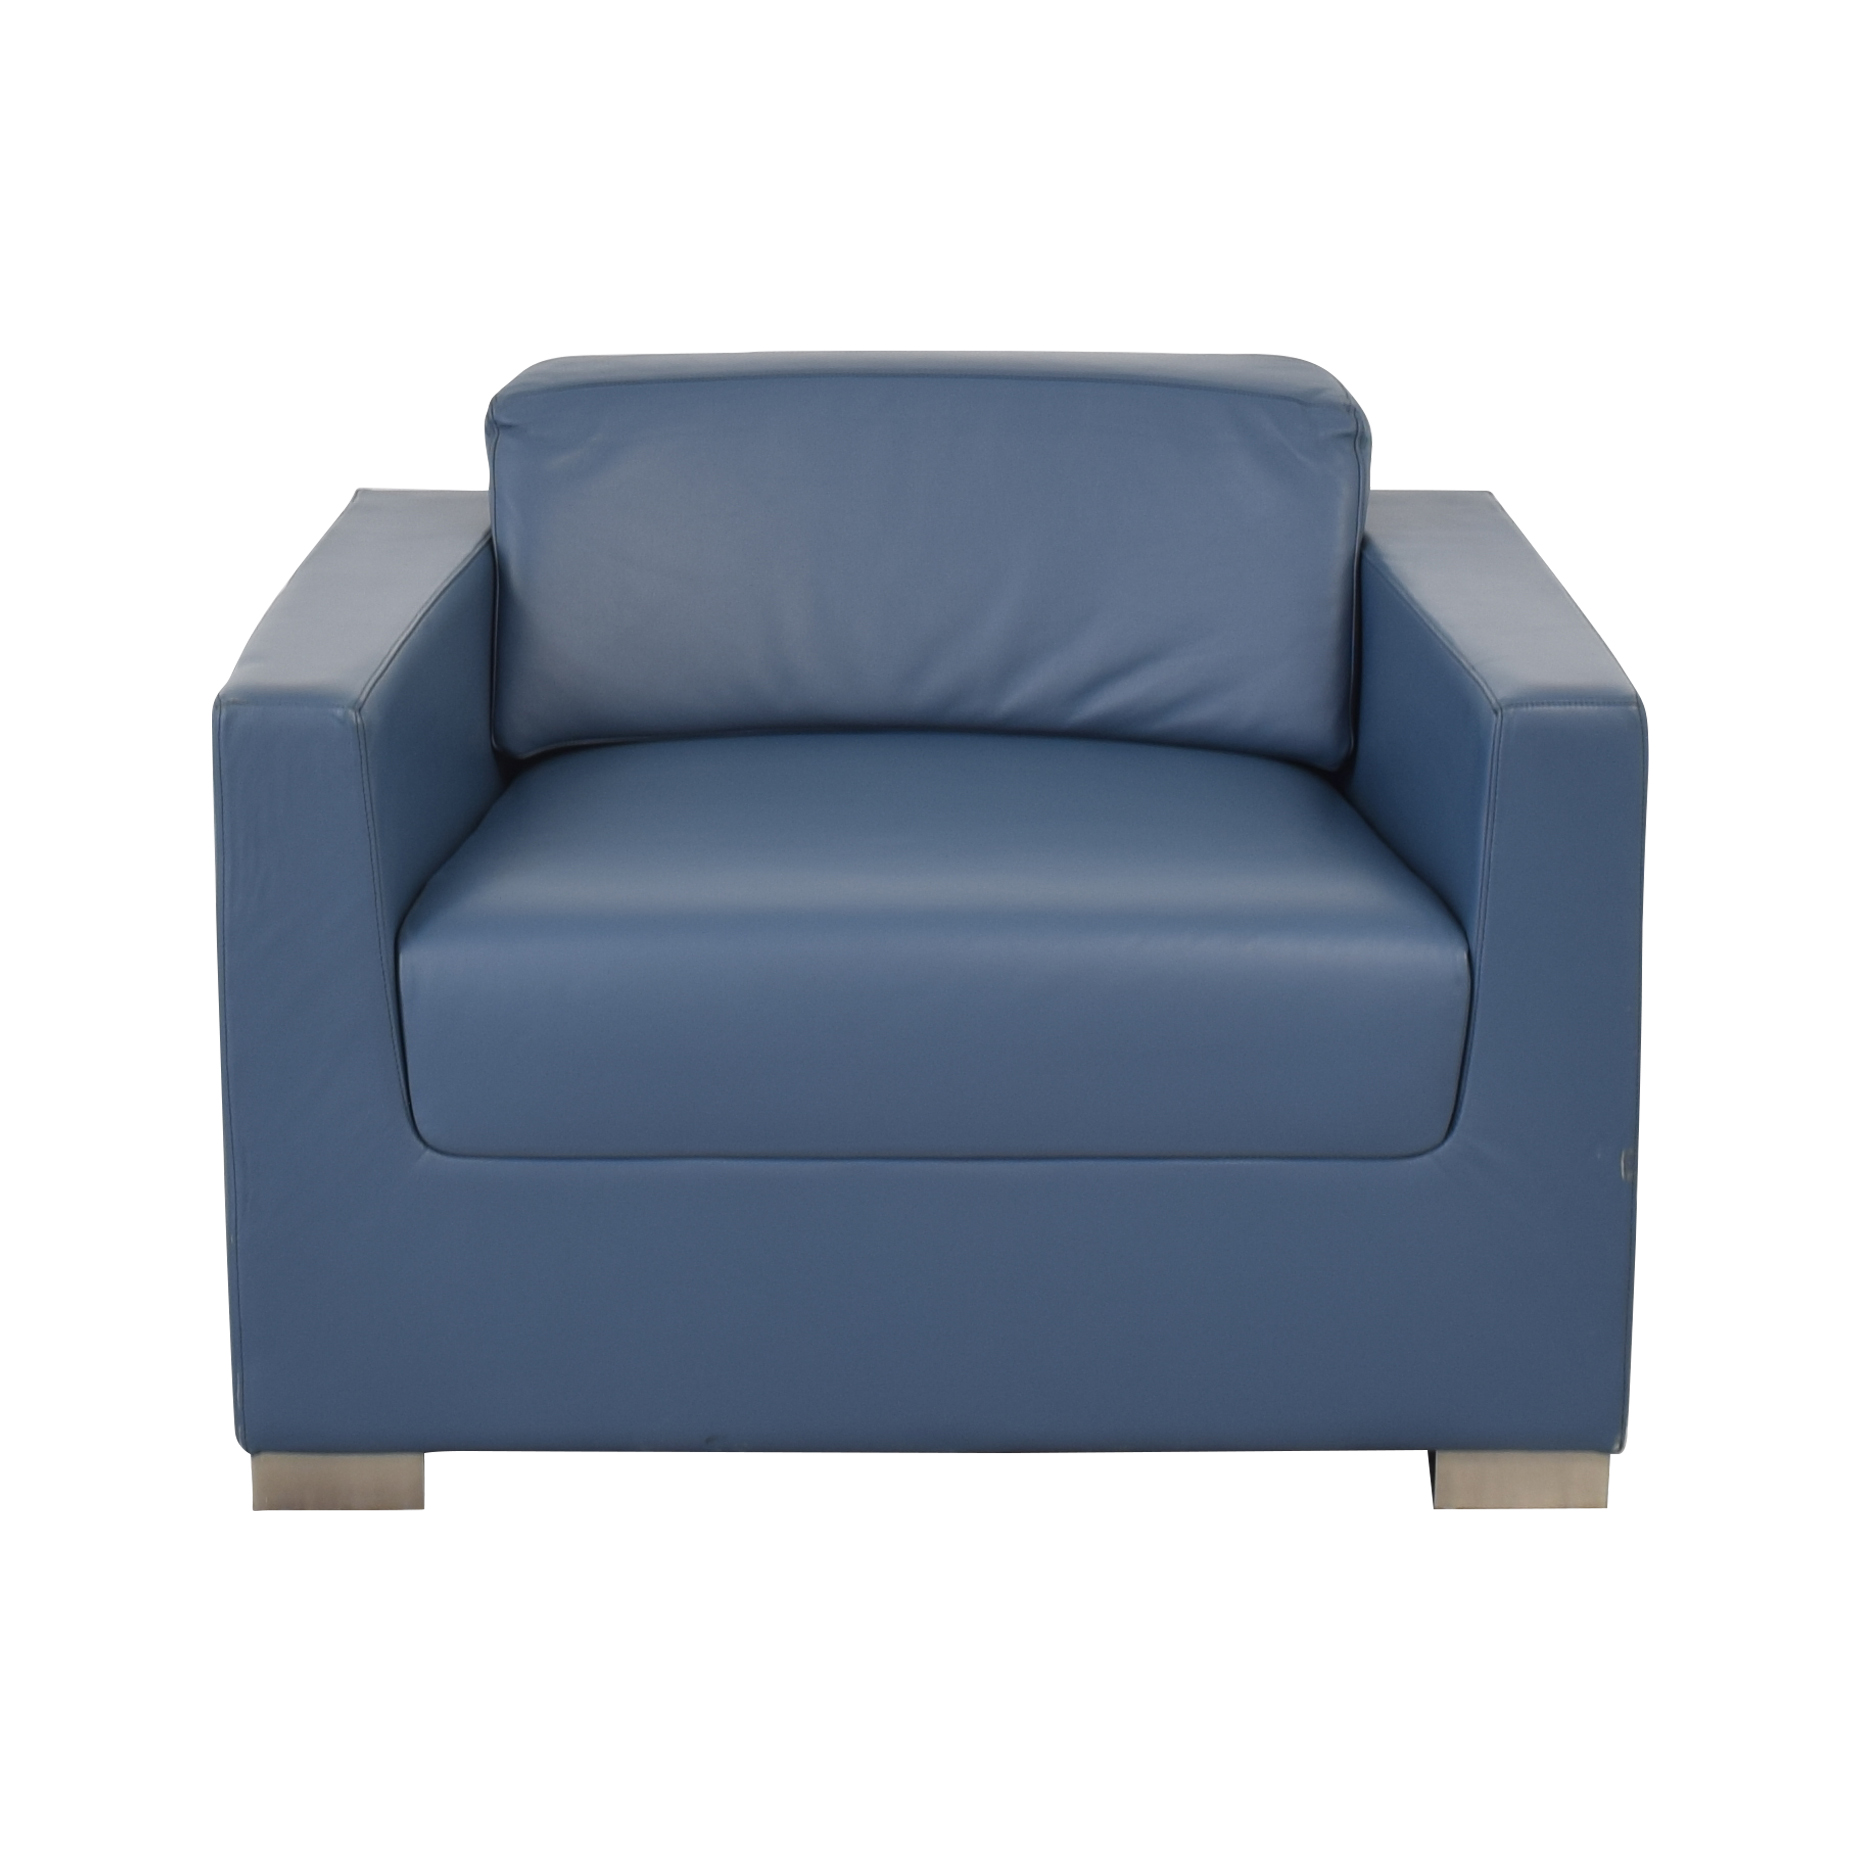 buy Bernhardt Design Blue Leather Arm Chair Bernhardt Accent Chairs